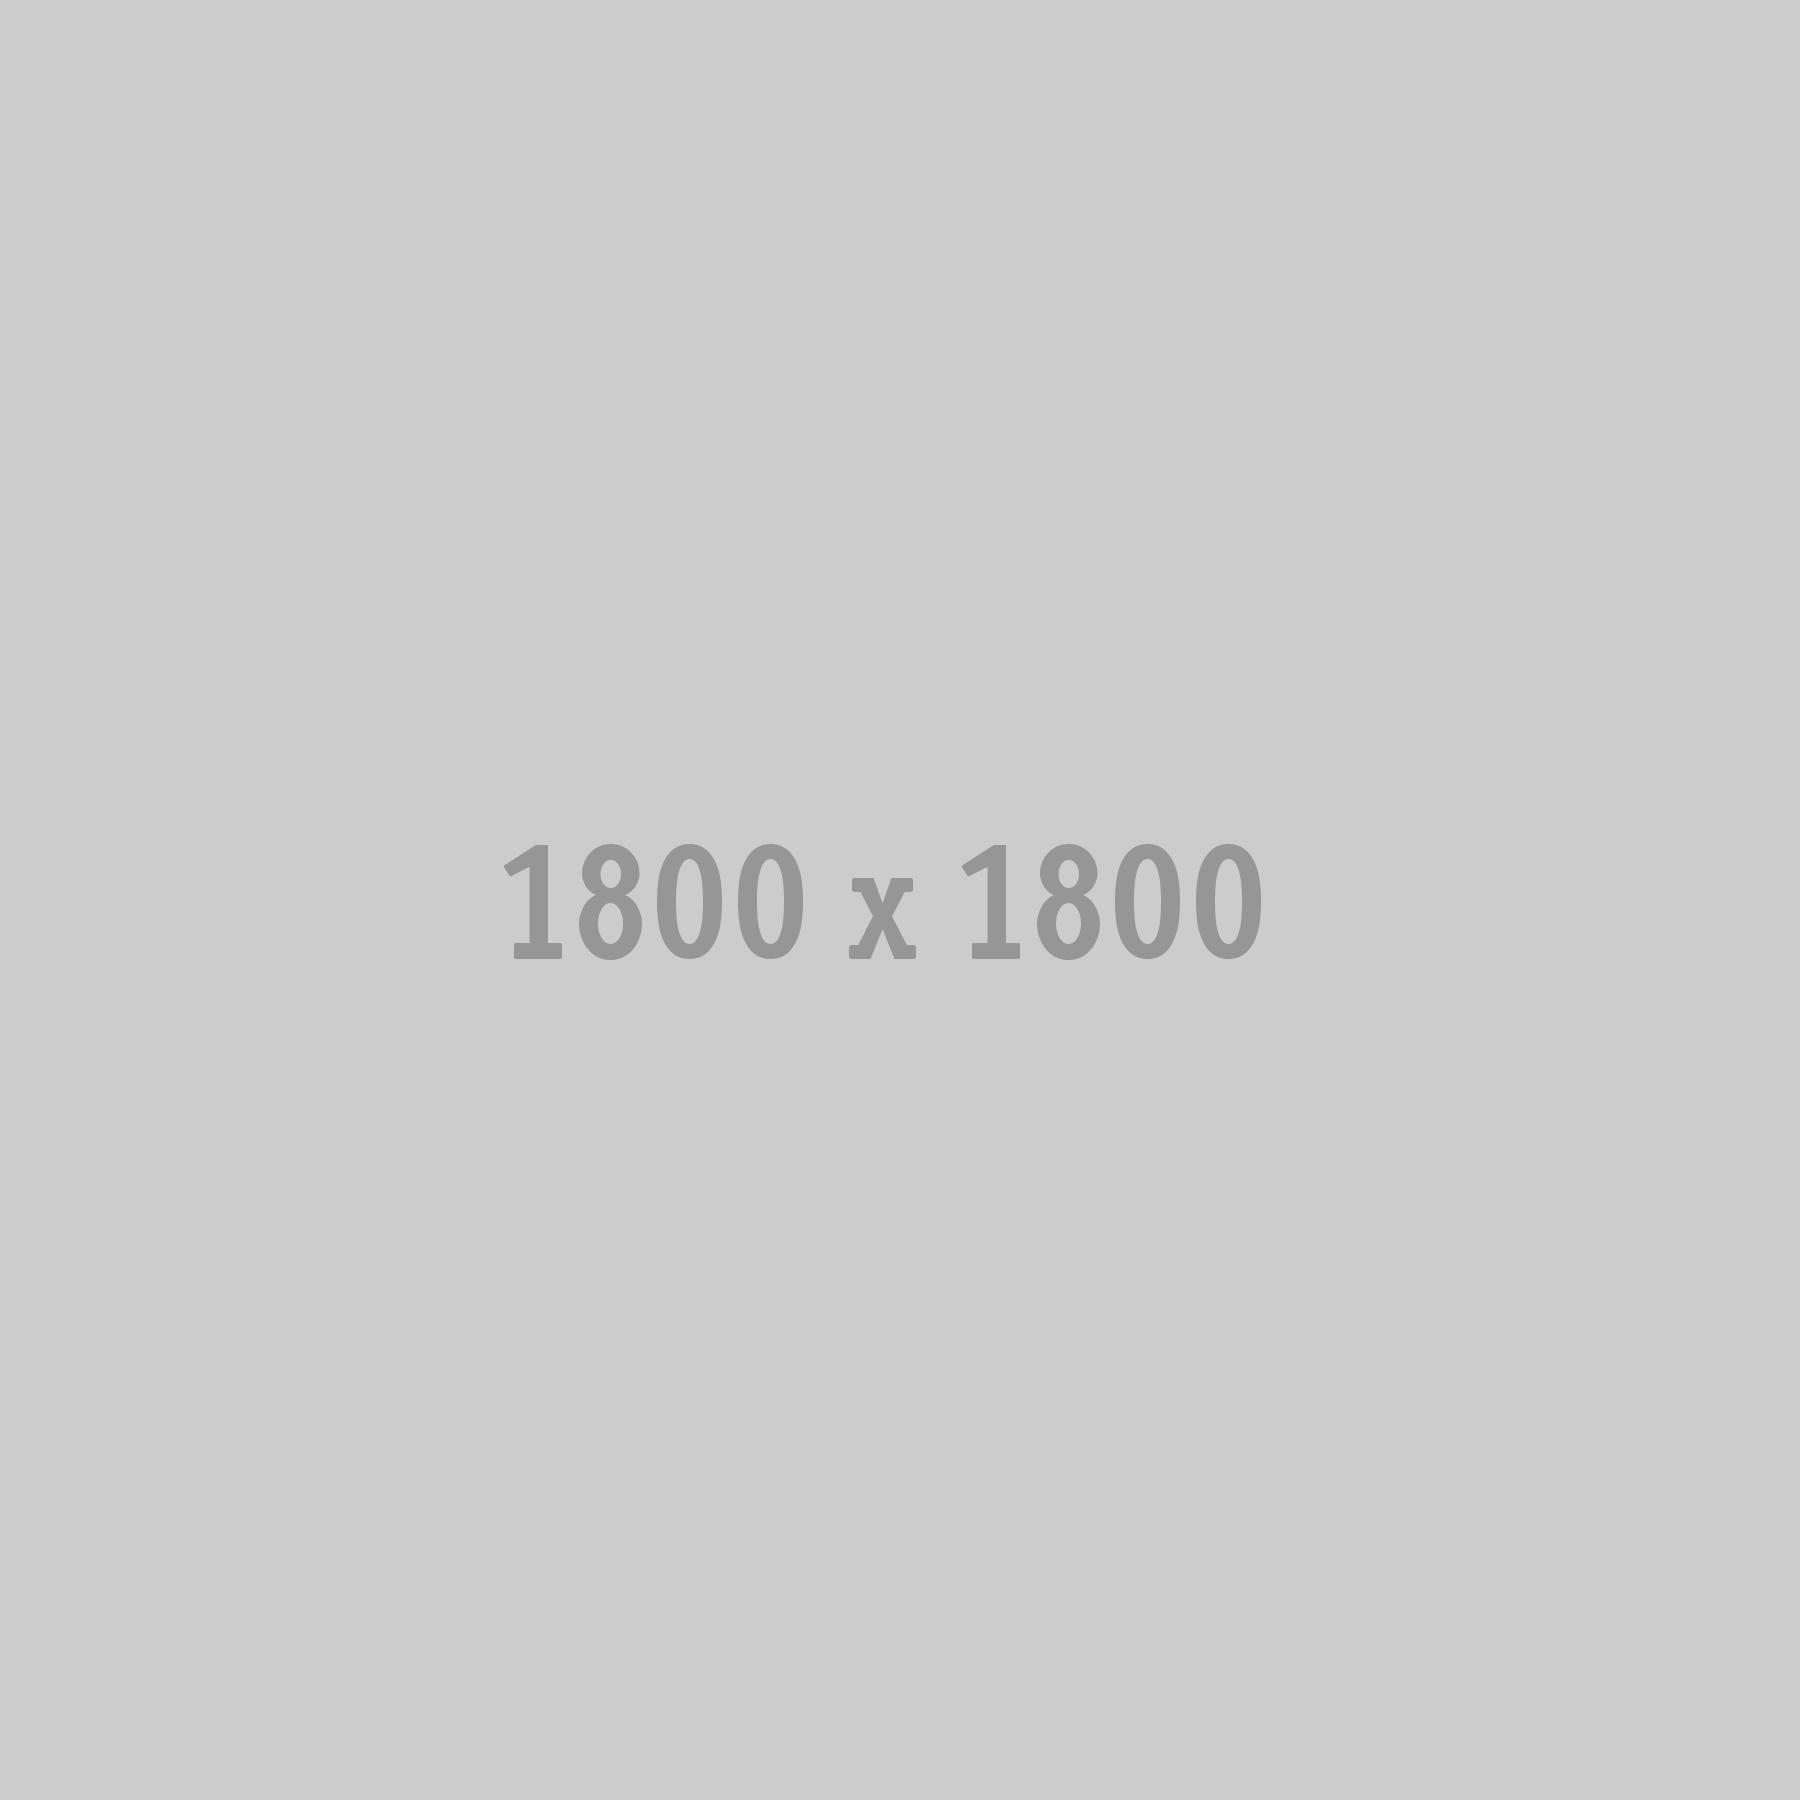 1800[1]